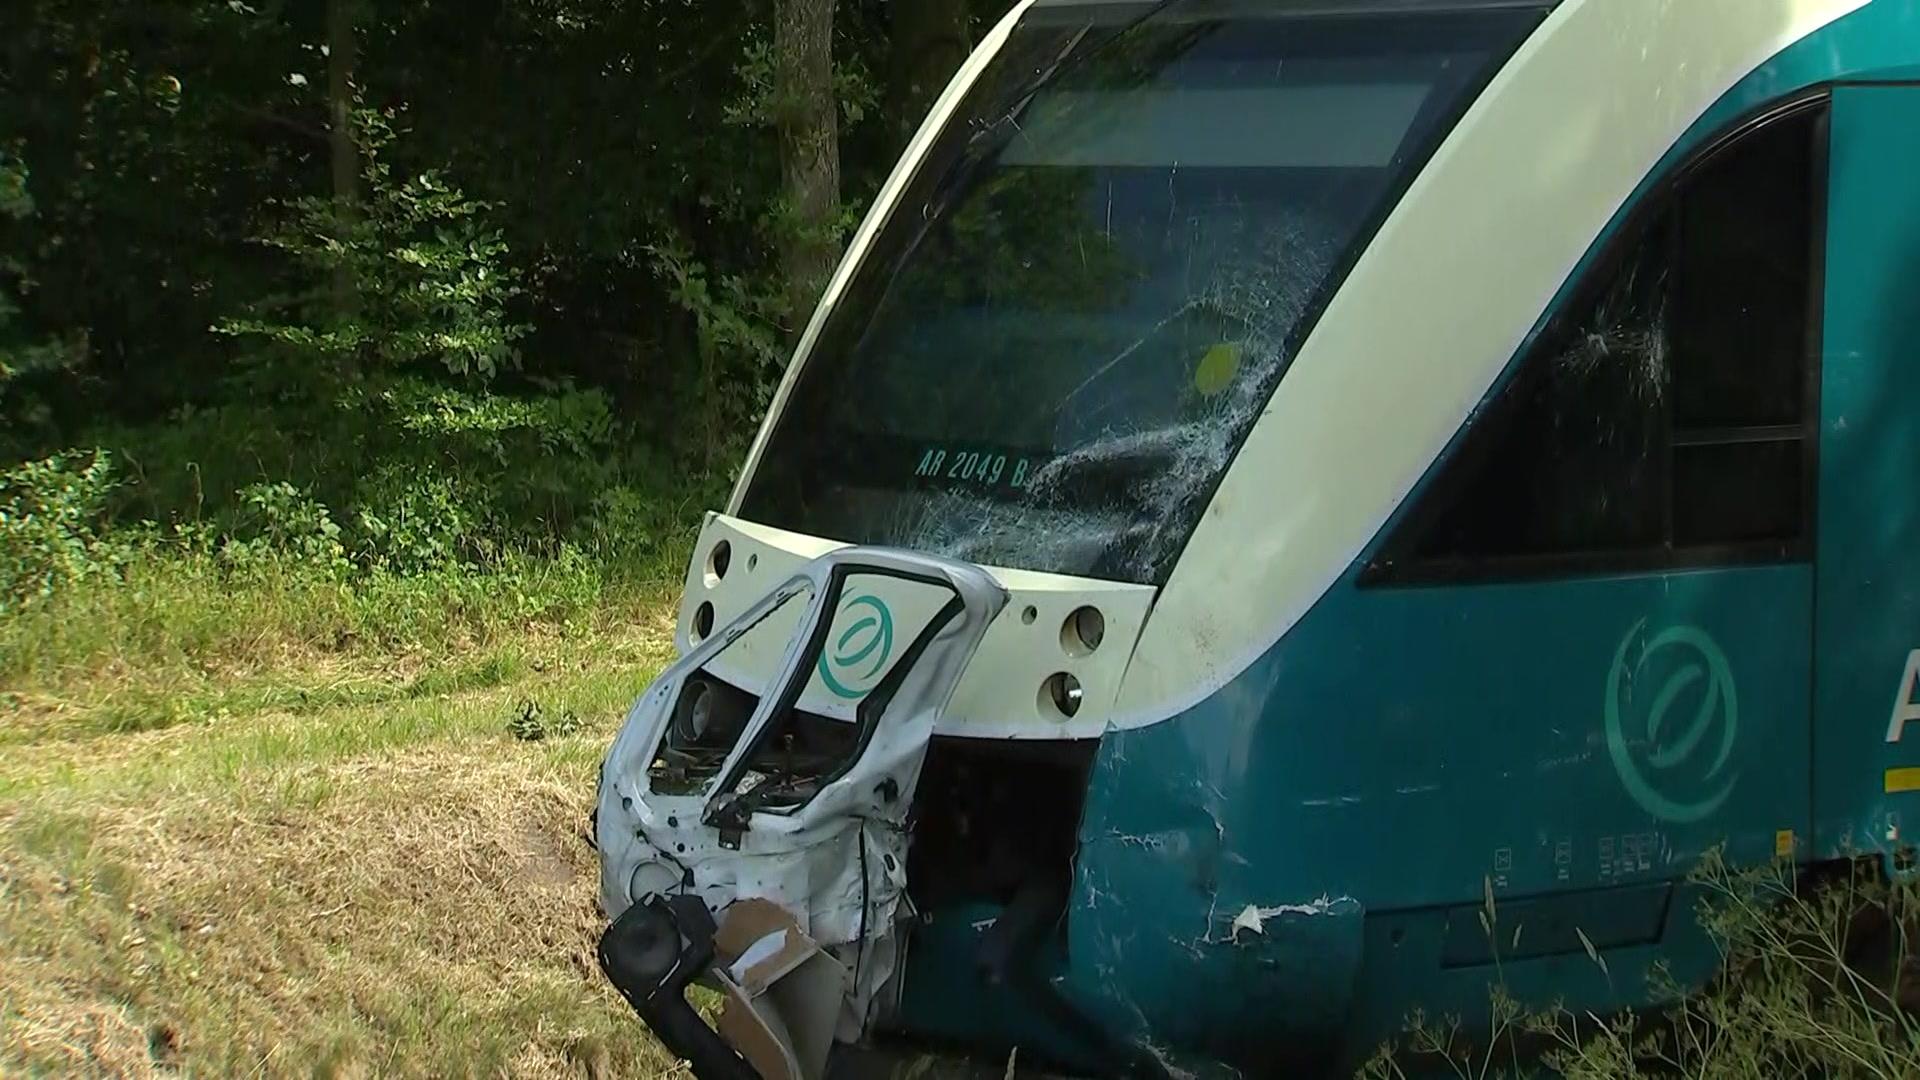 9932877_thjt_indland_togulykke_varde-15.40.00.13_0.jpg